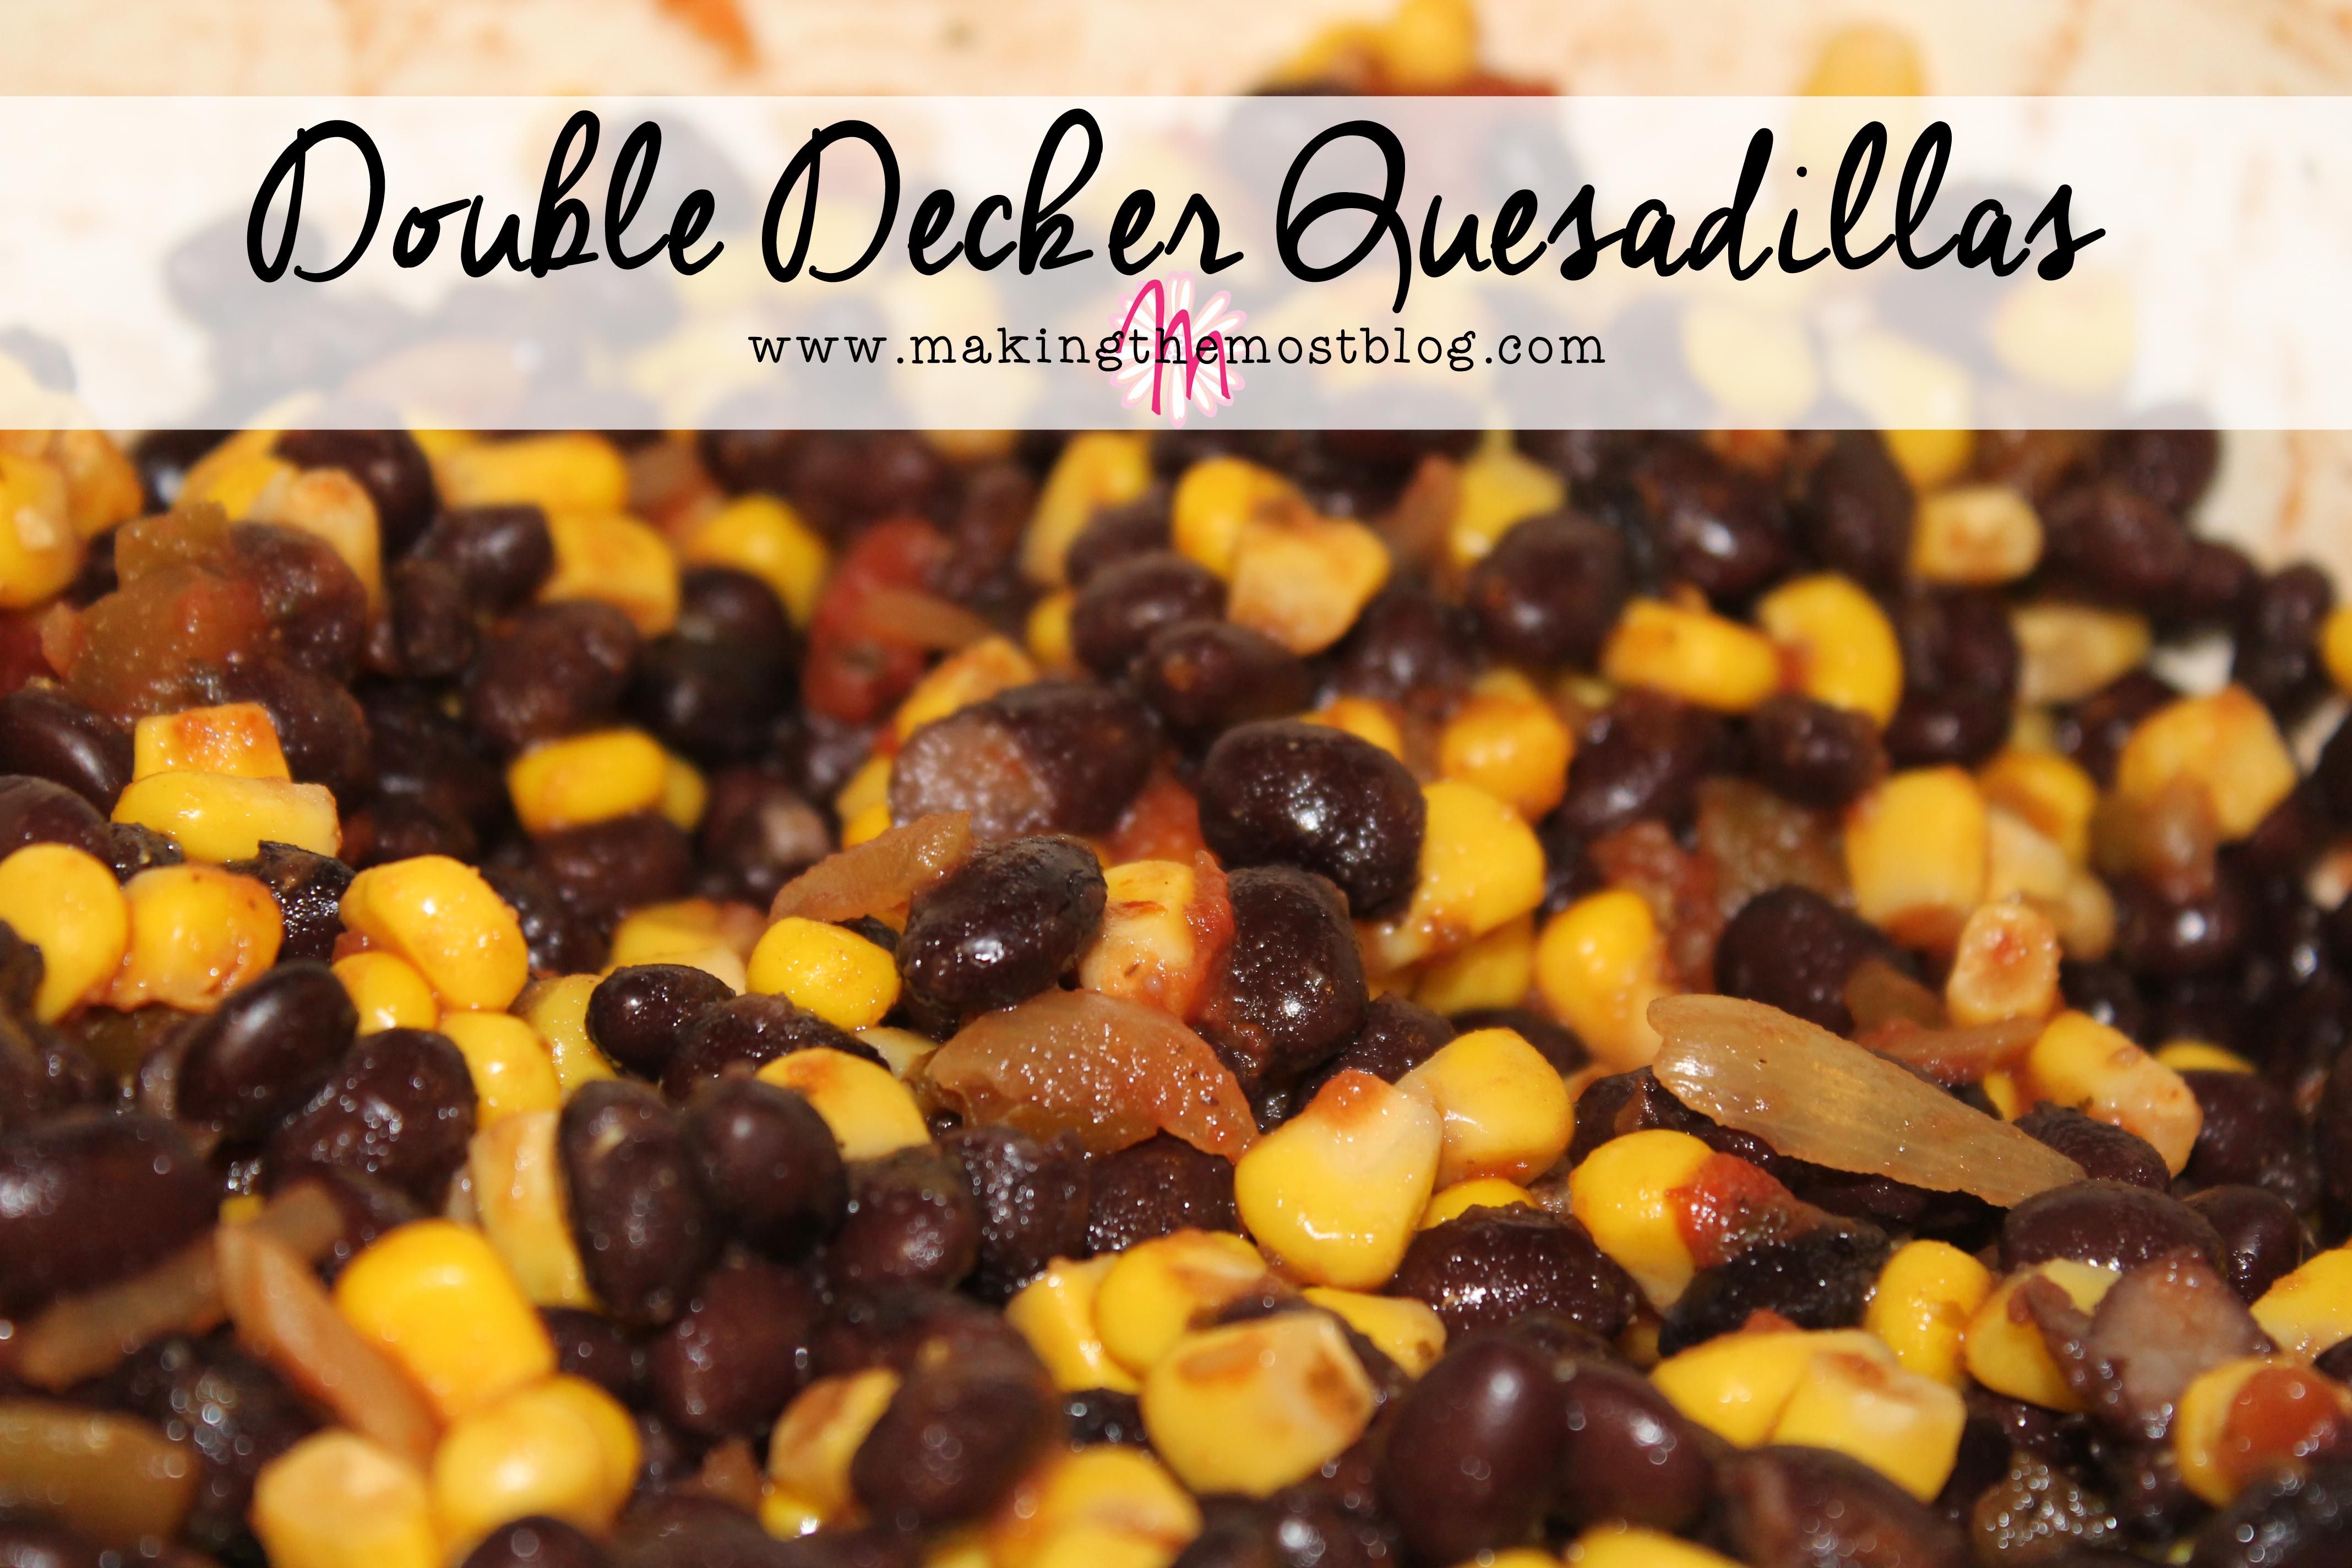 Double Decker Quesadilla Recipe | Making the Most Blog